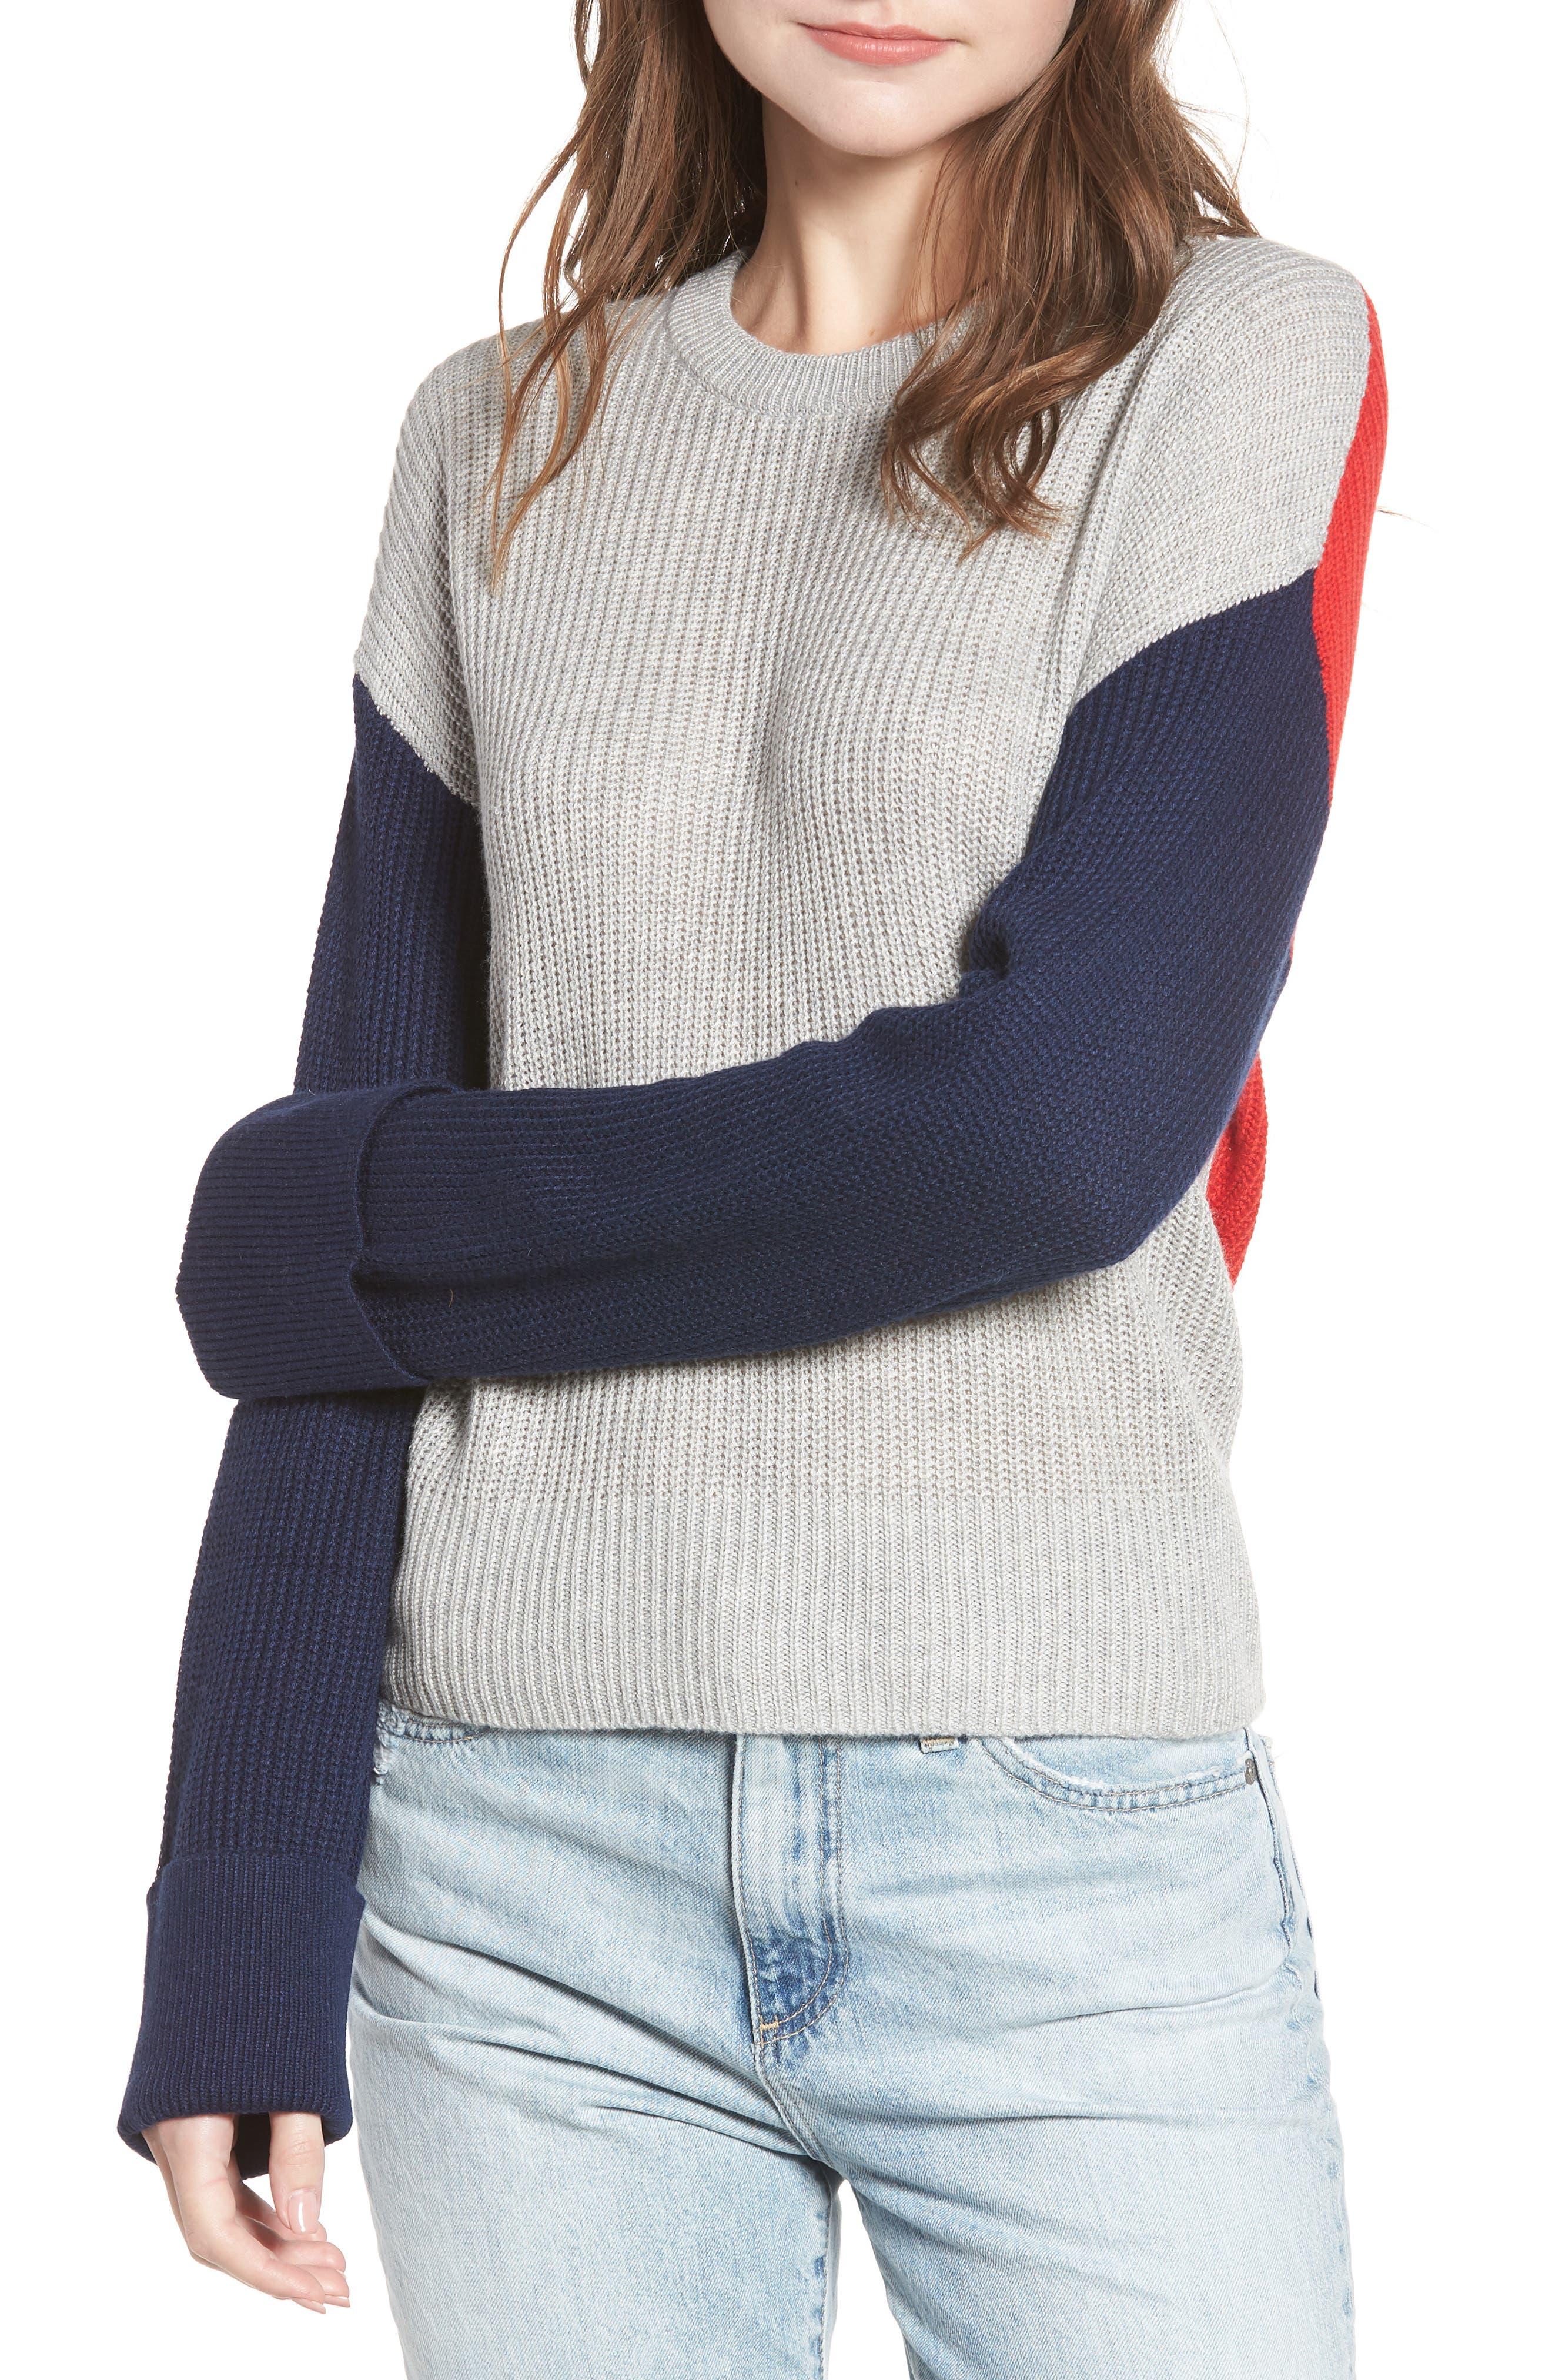 Colorblock Sweater,                         Main,                         color, GREY/ NAVY